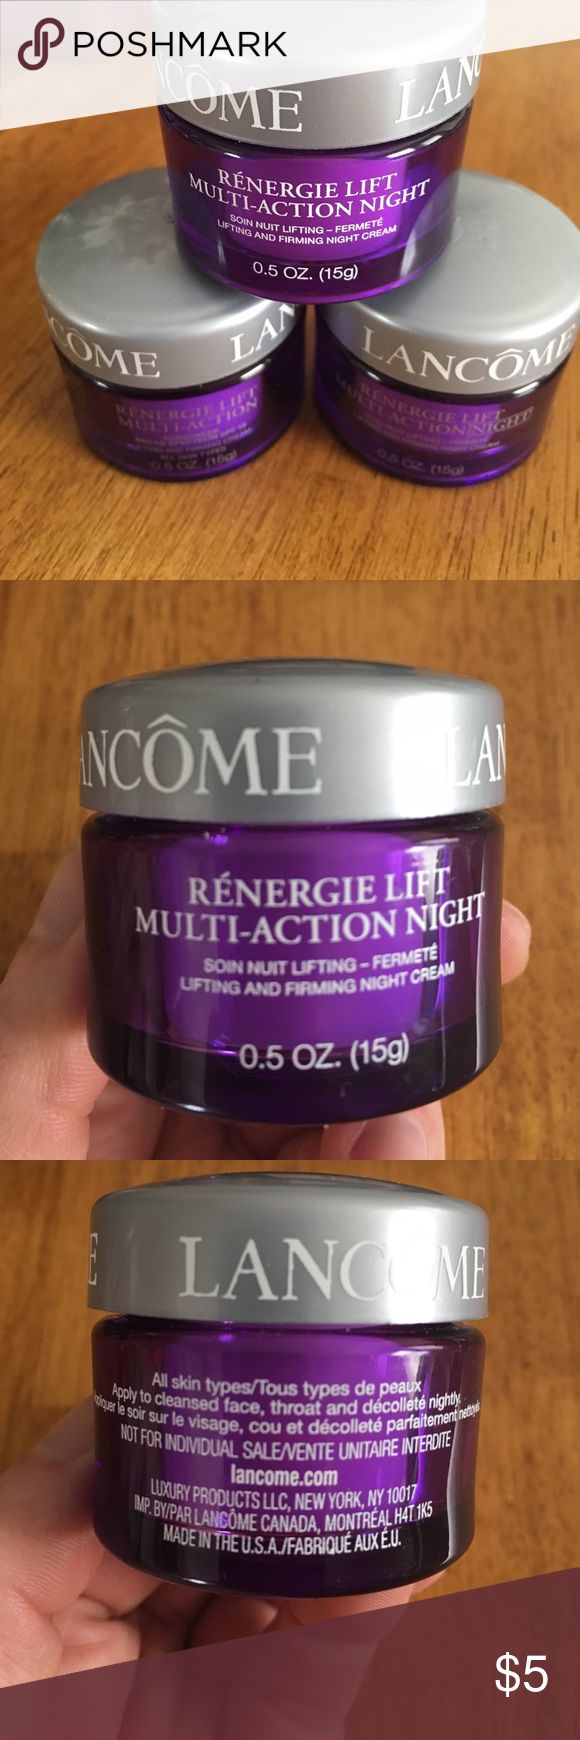 Lancôme Renergie Lift MultiAction Night Cream Lancôme